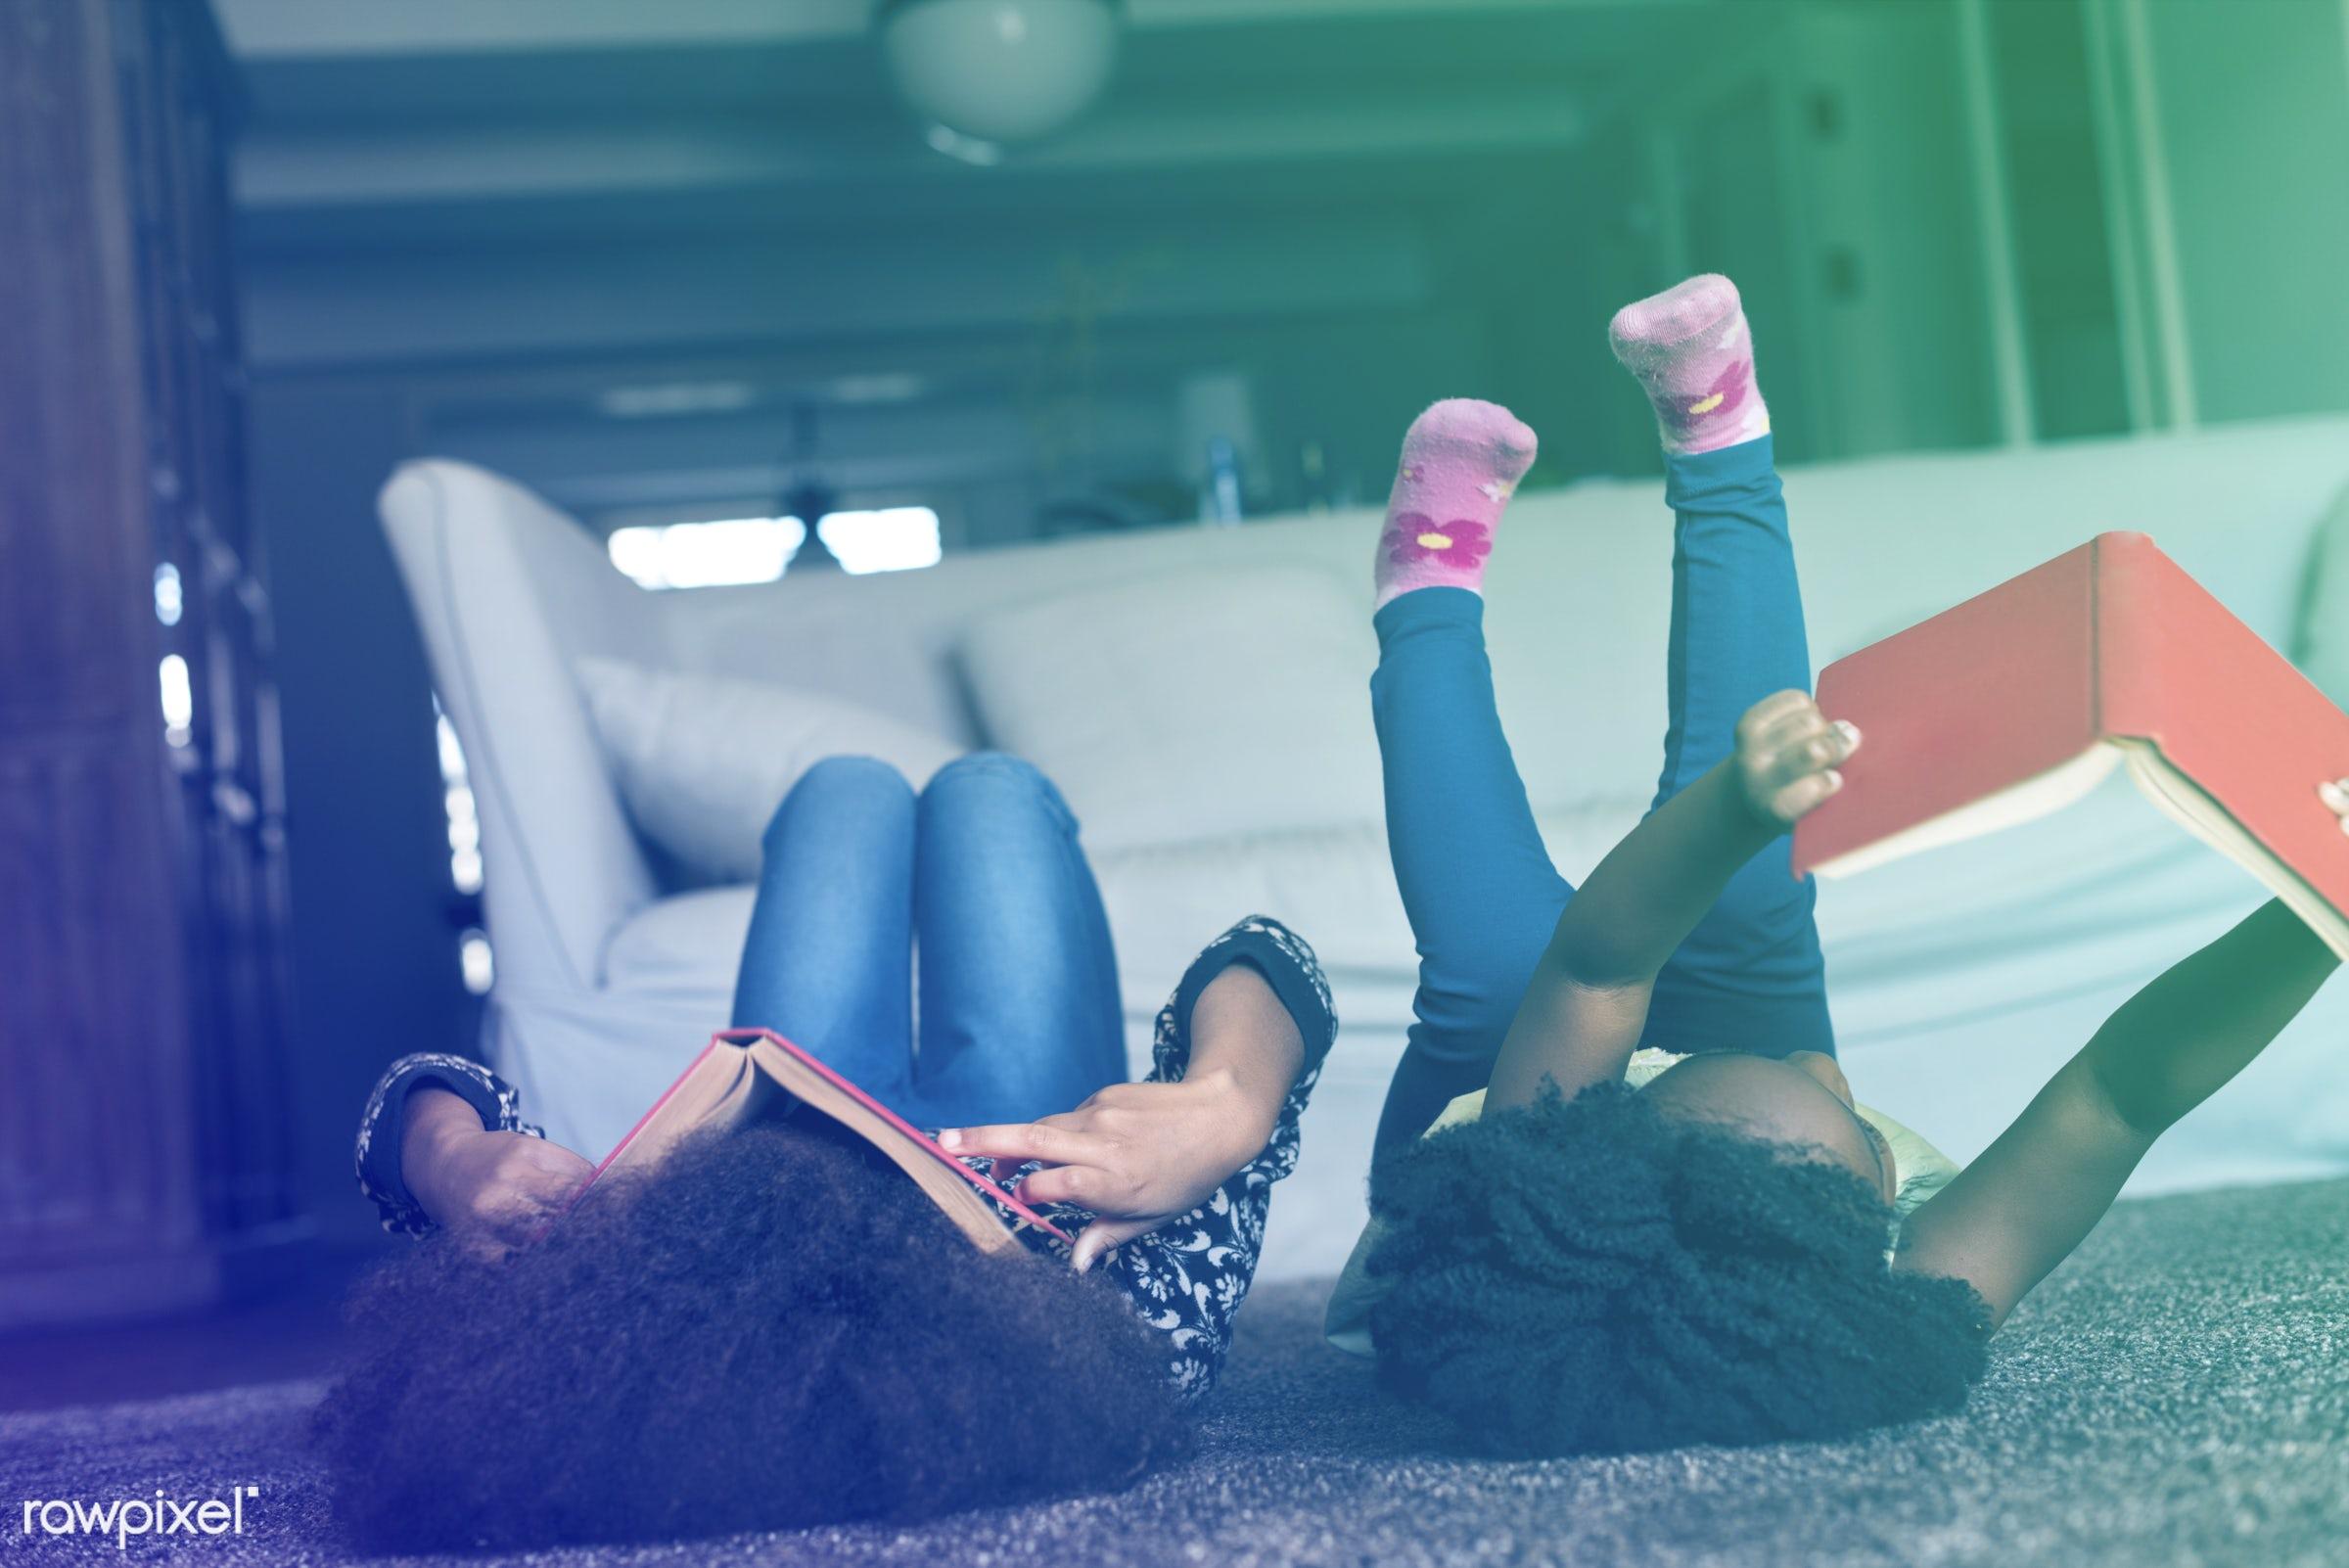 person, relax, sisterhood, carpet, house, people, break, family, serenity, lifestyle, childhood, little girl, home sweet...